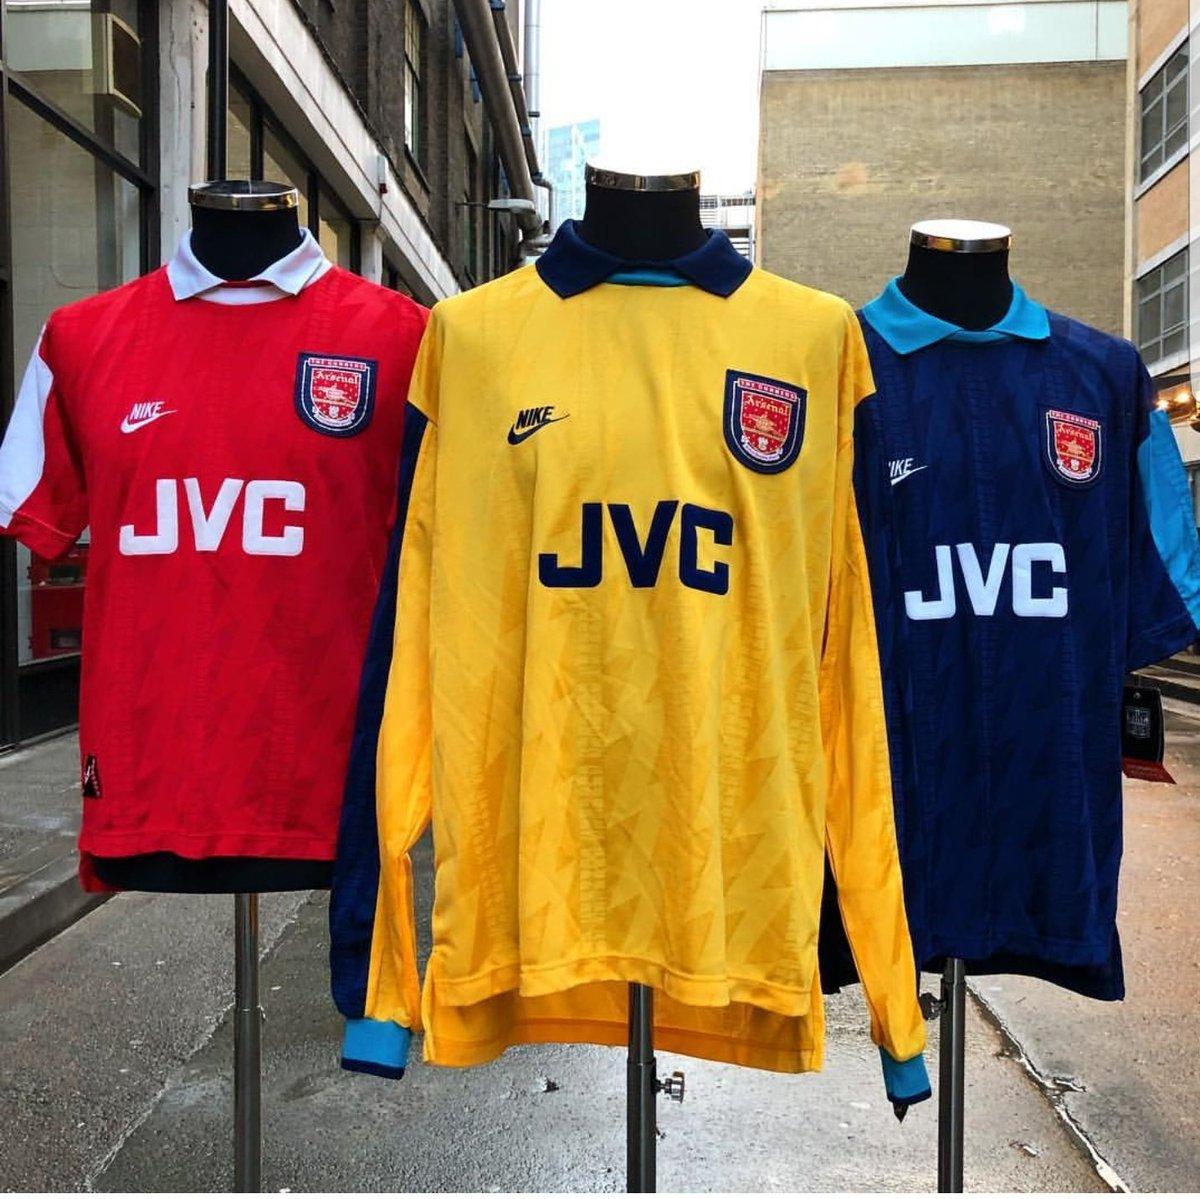 9c46292f4 Classic Football Shirts LDN on Twitter